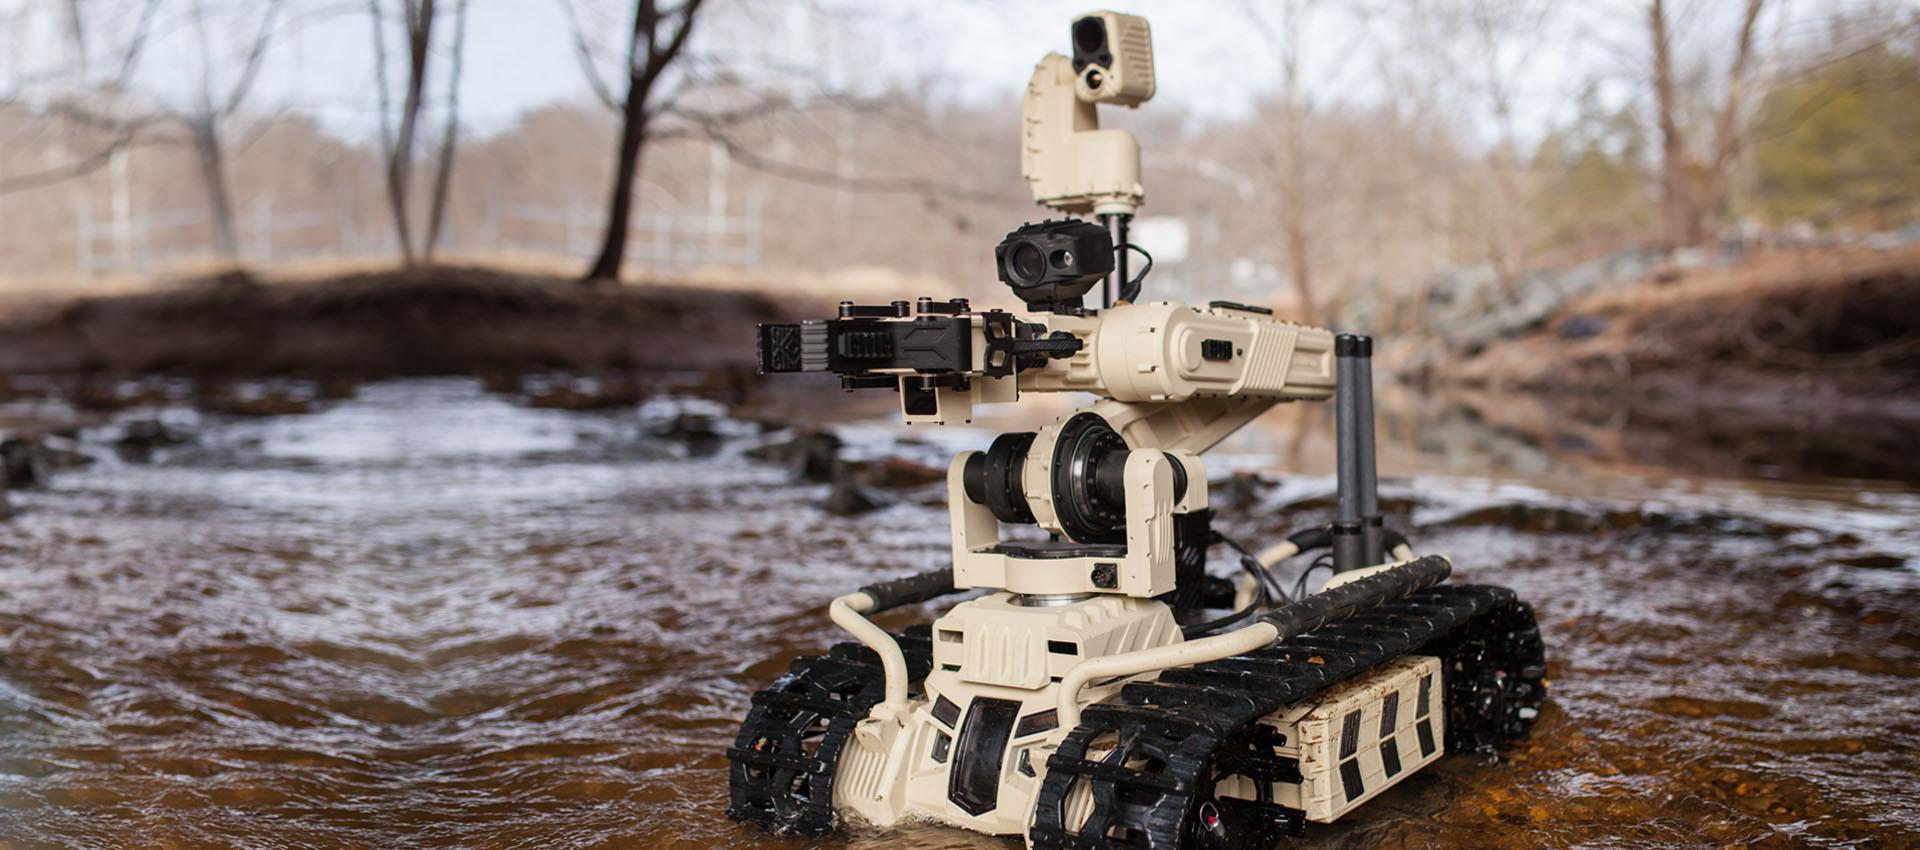 military robots - HD1920×850